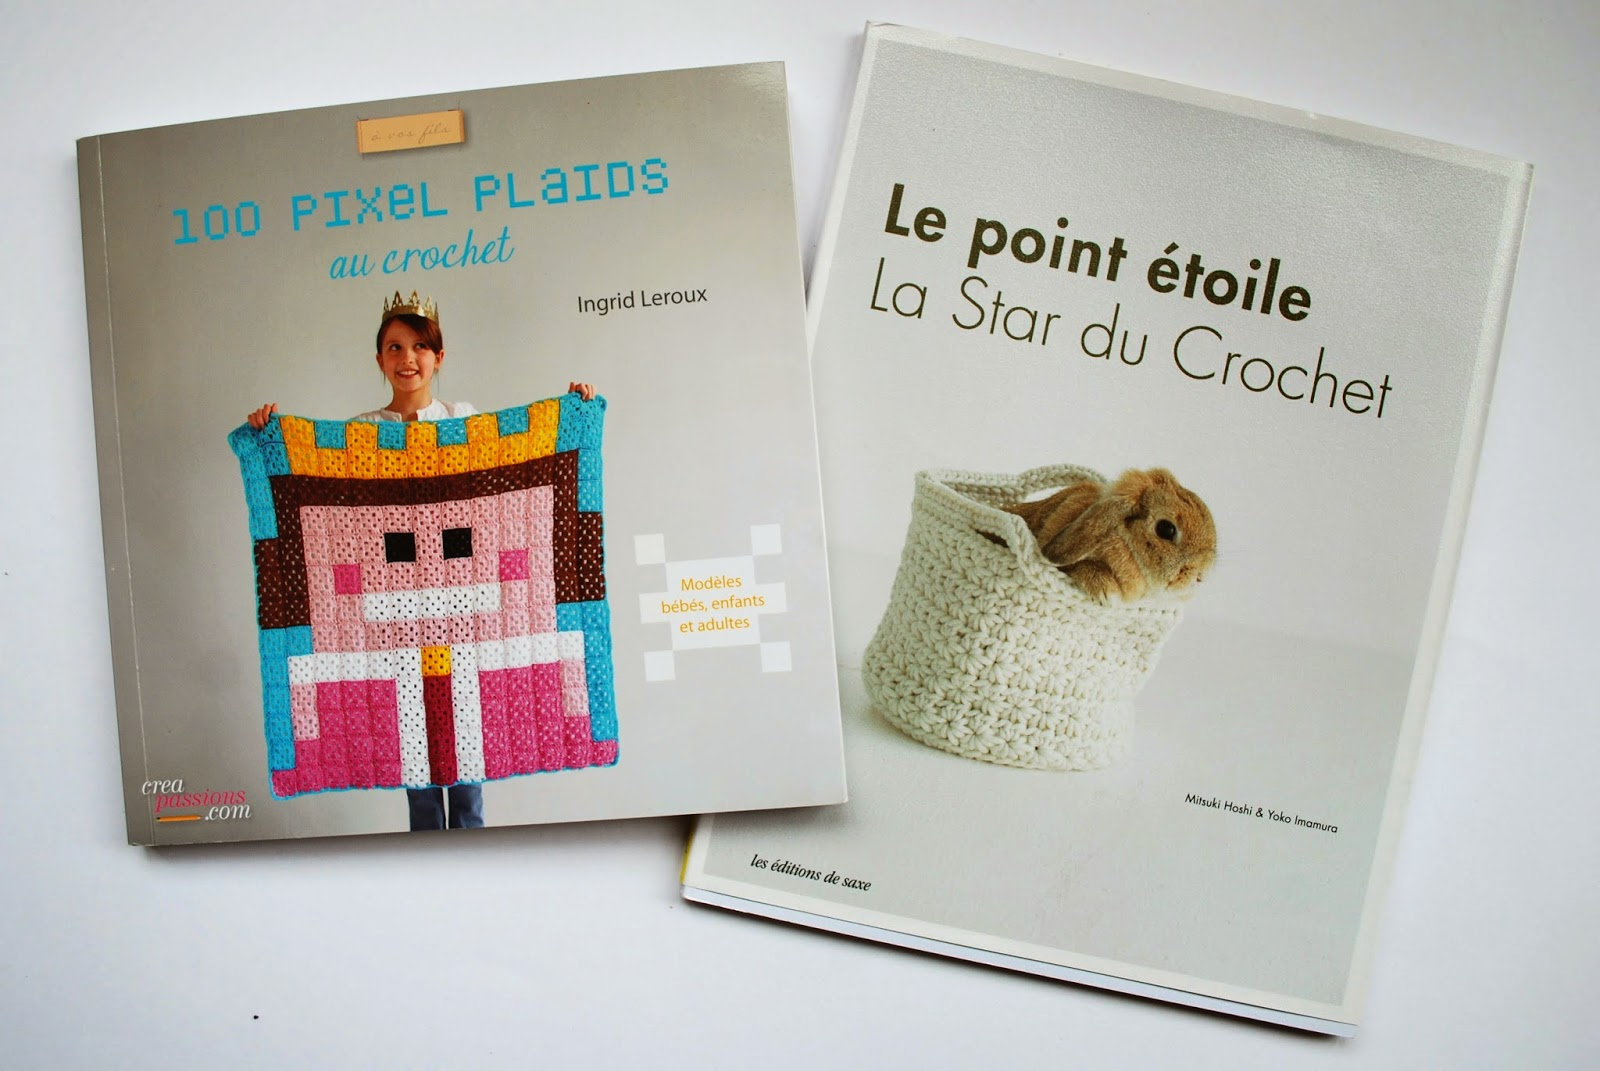 Libros de ganchillo en francés